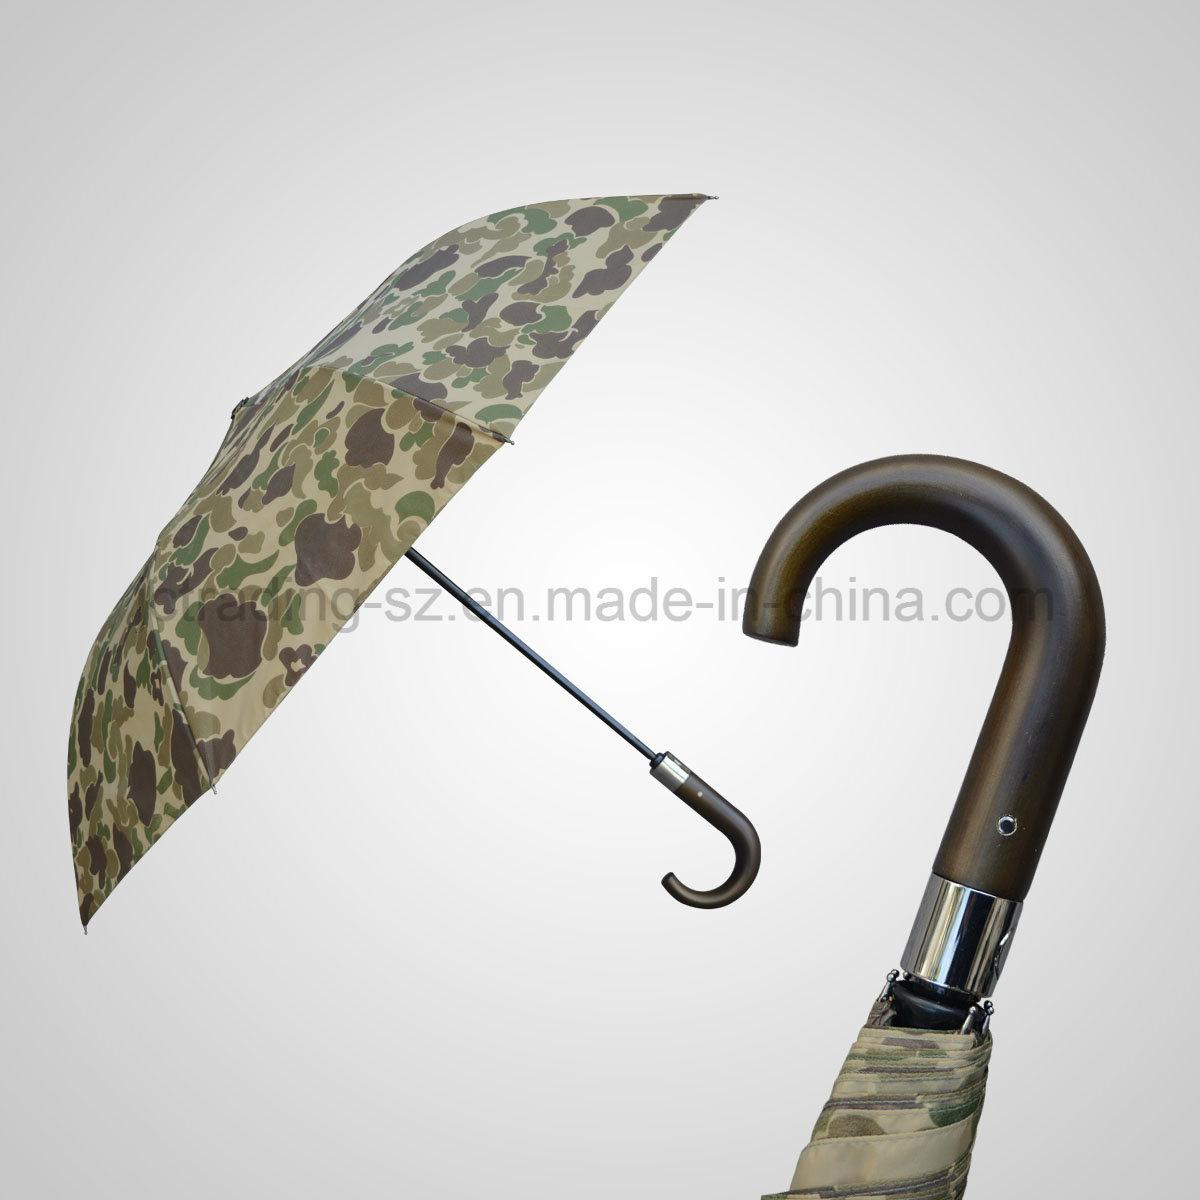 High Quality 2 Folding Automatic Open&Close Sun/Rain Umbrella (JF-AQT231)